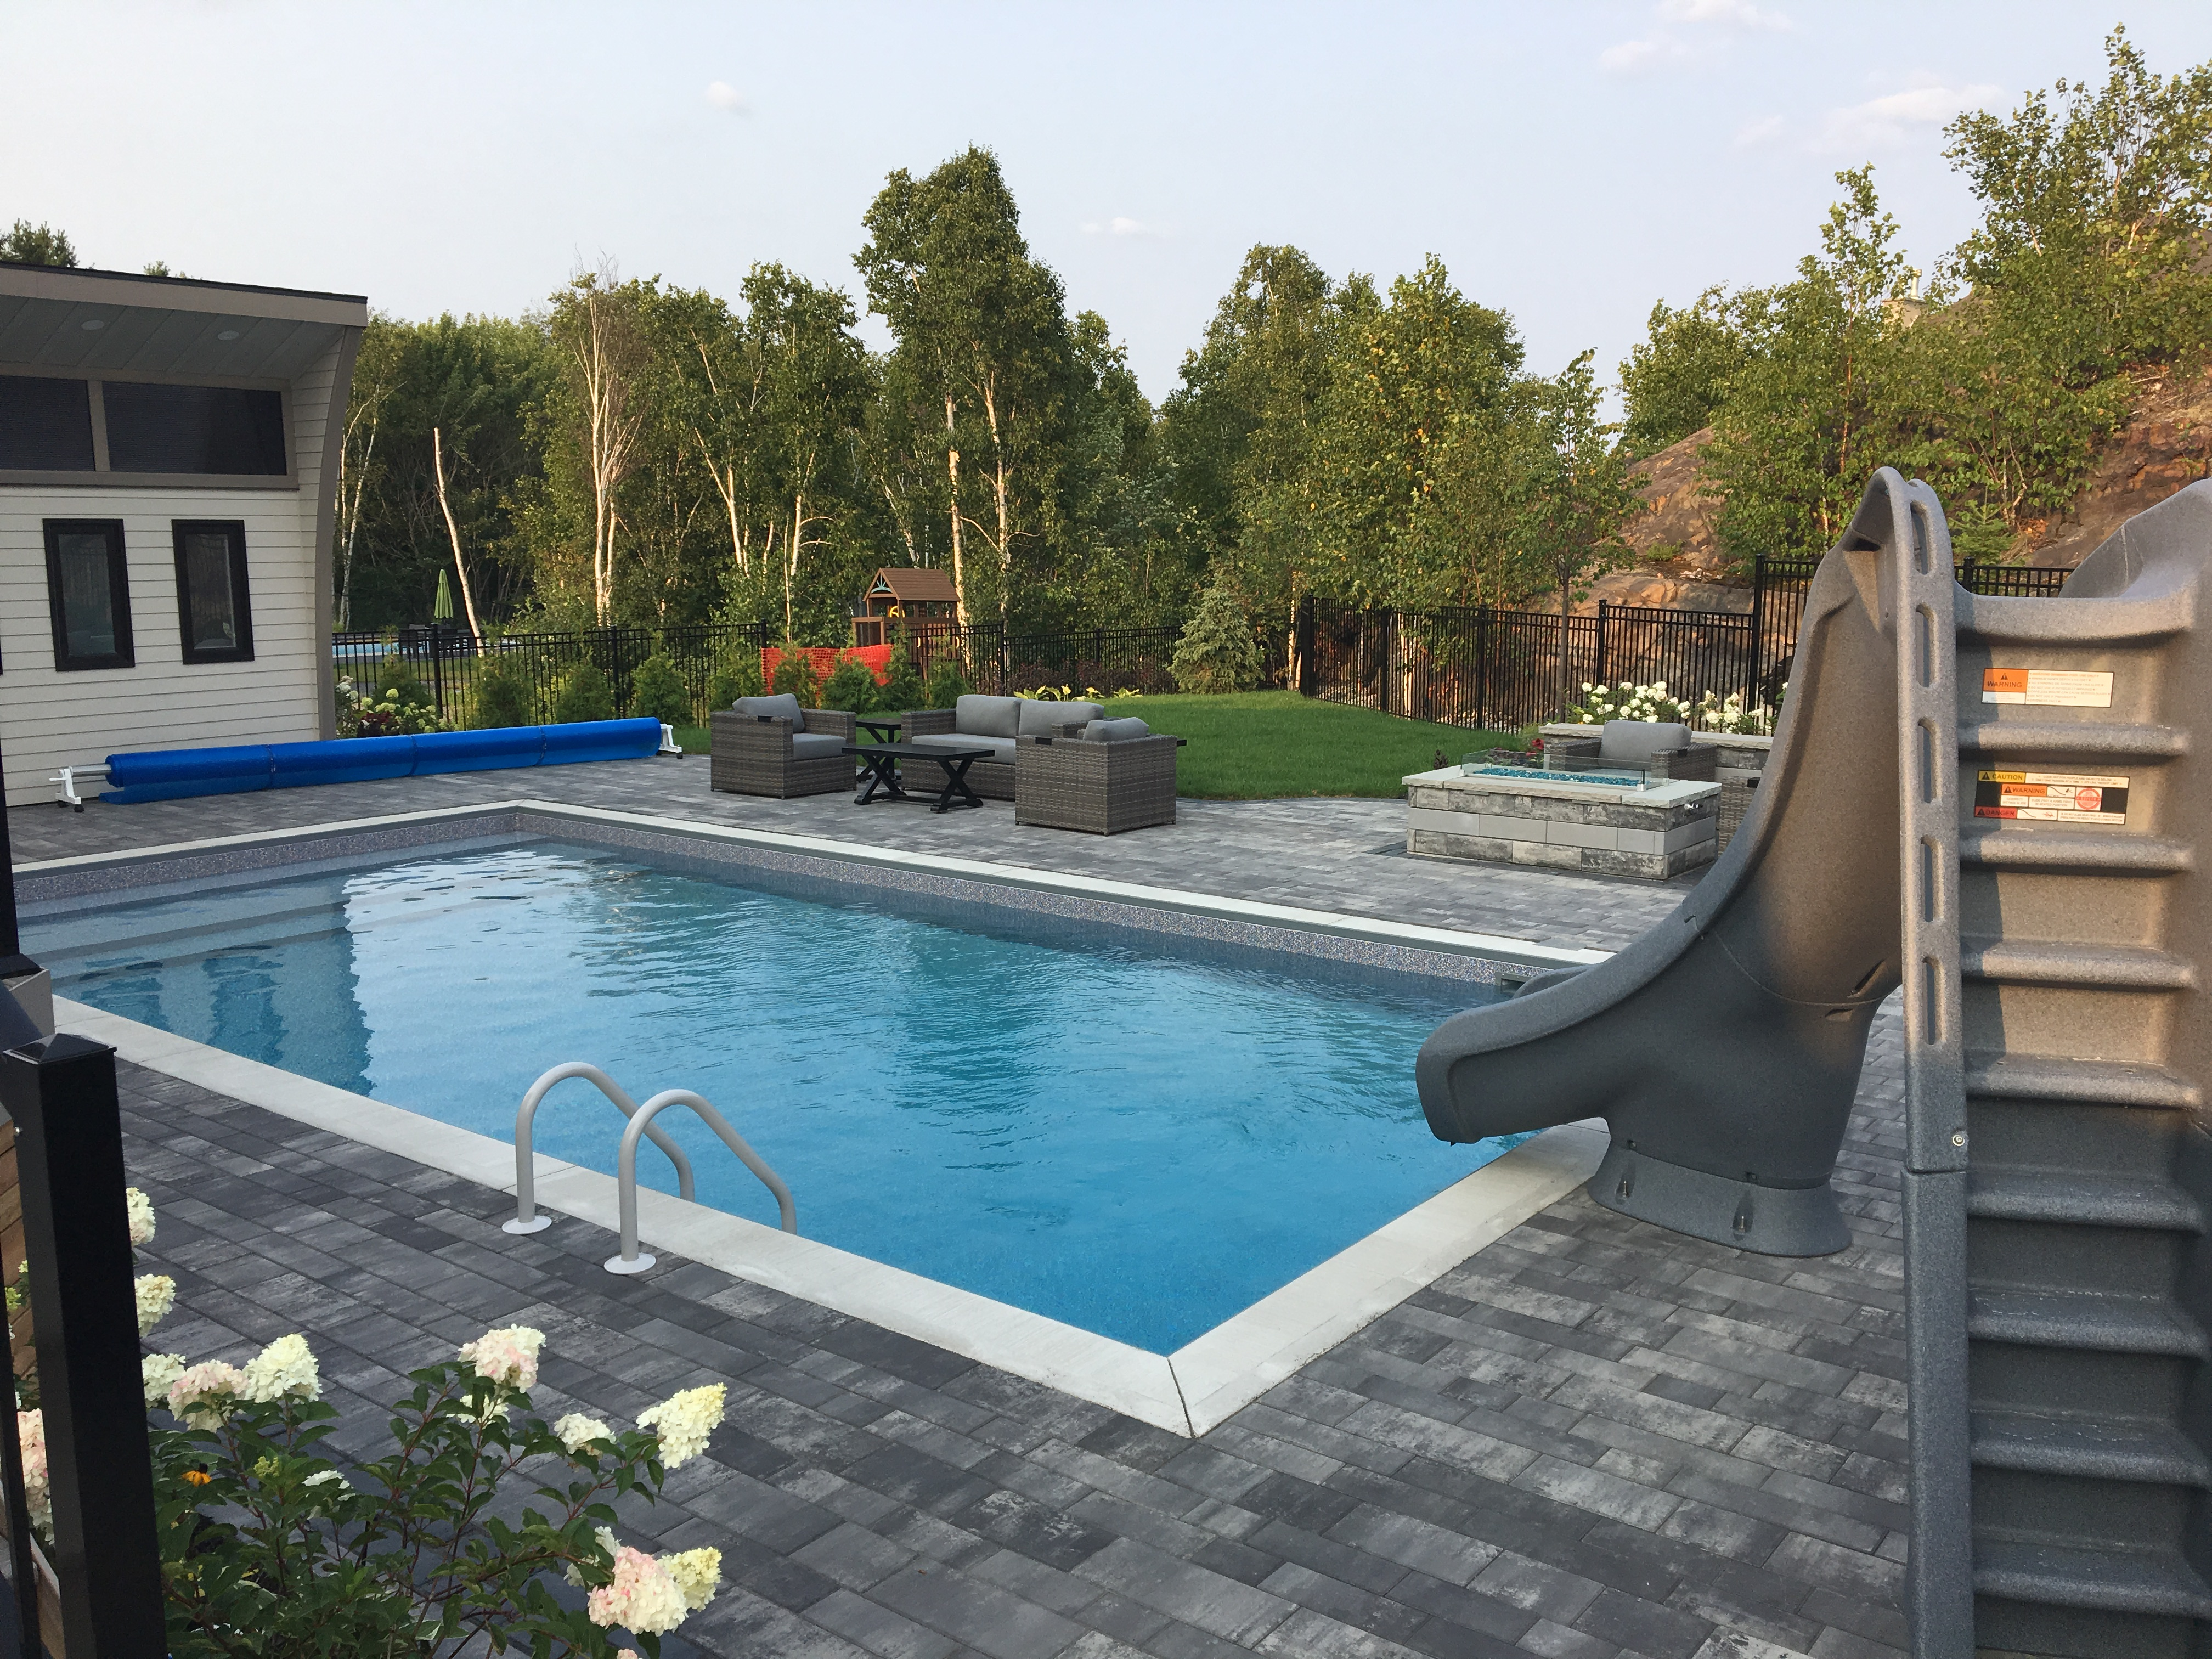 Pool & pool house2